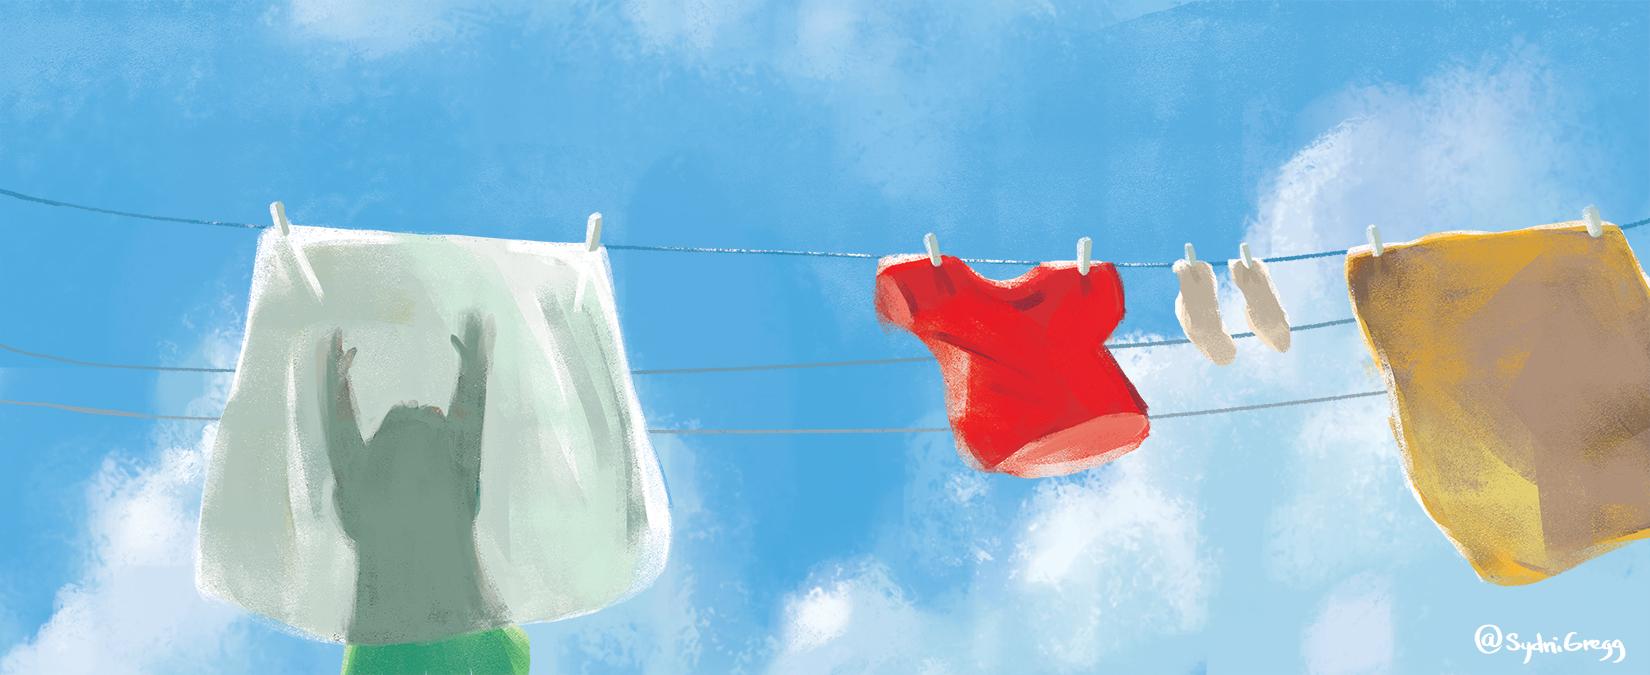 LaundryLines_SydniGregg.jpg